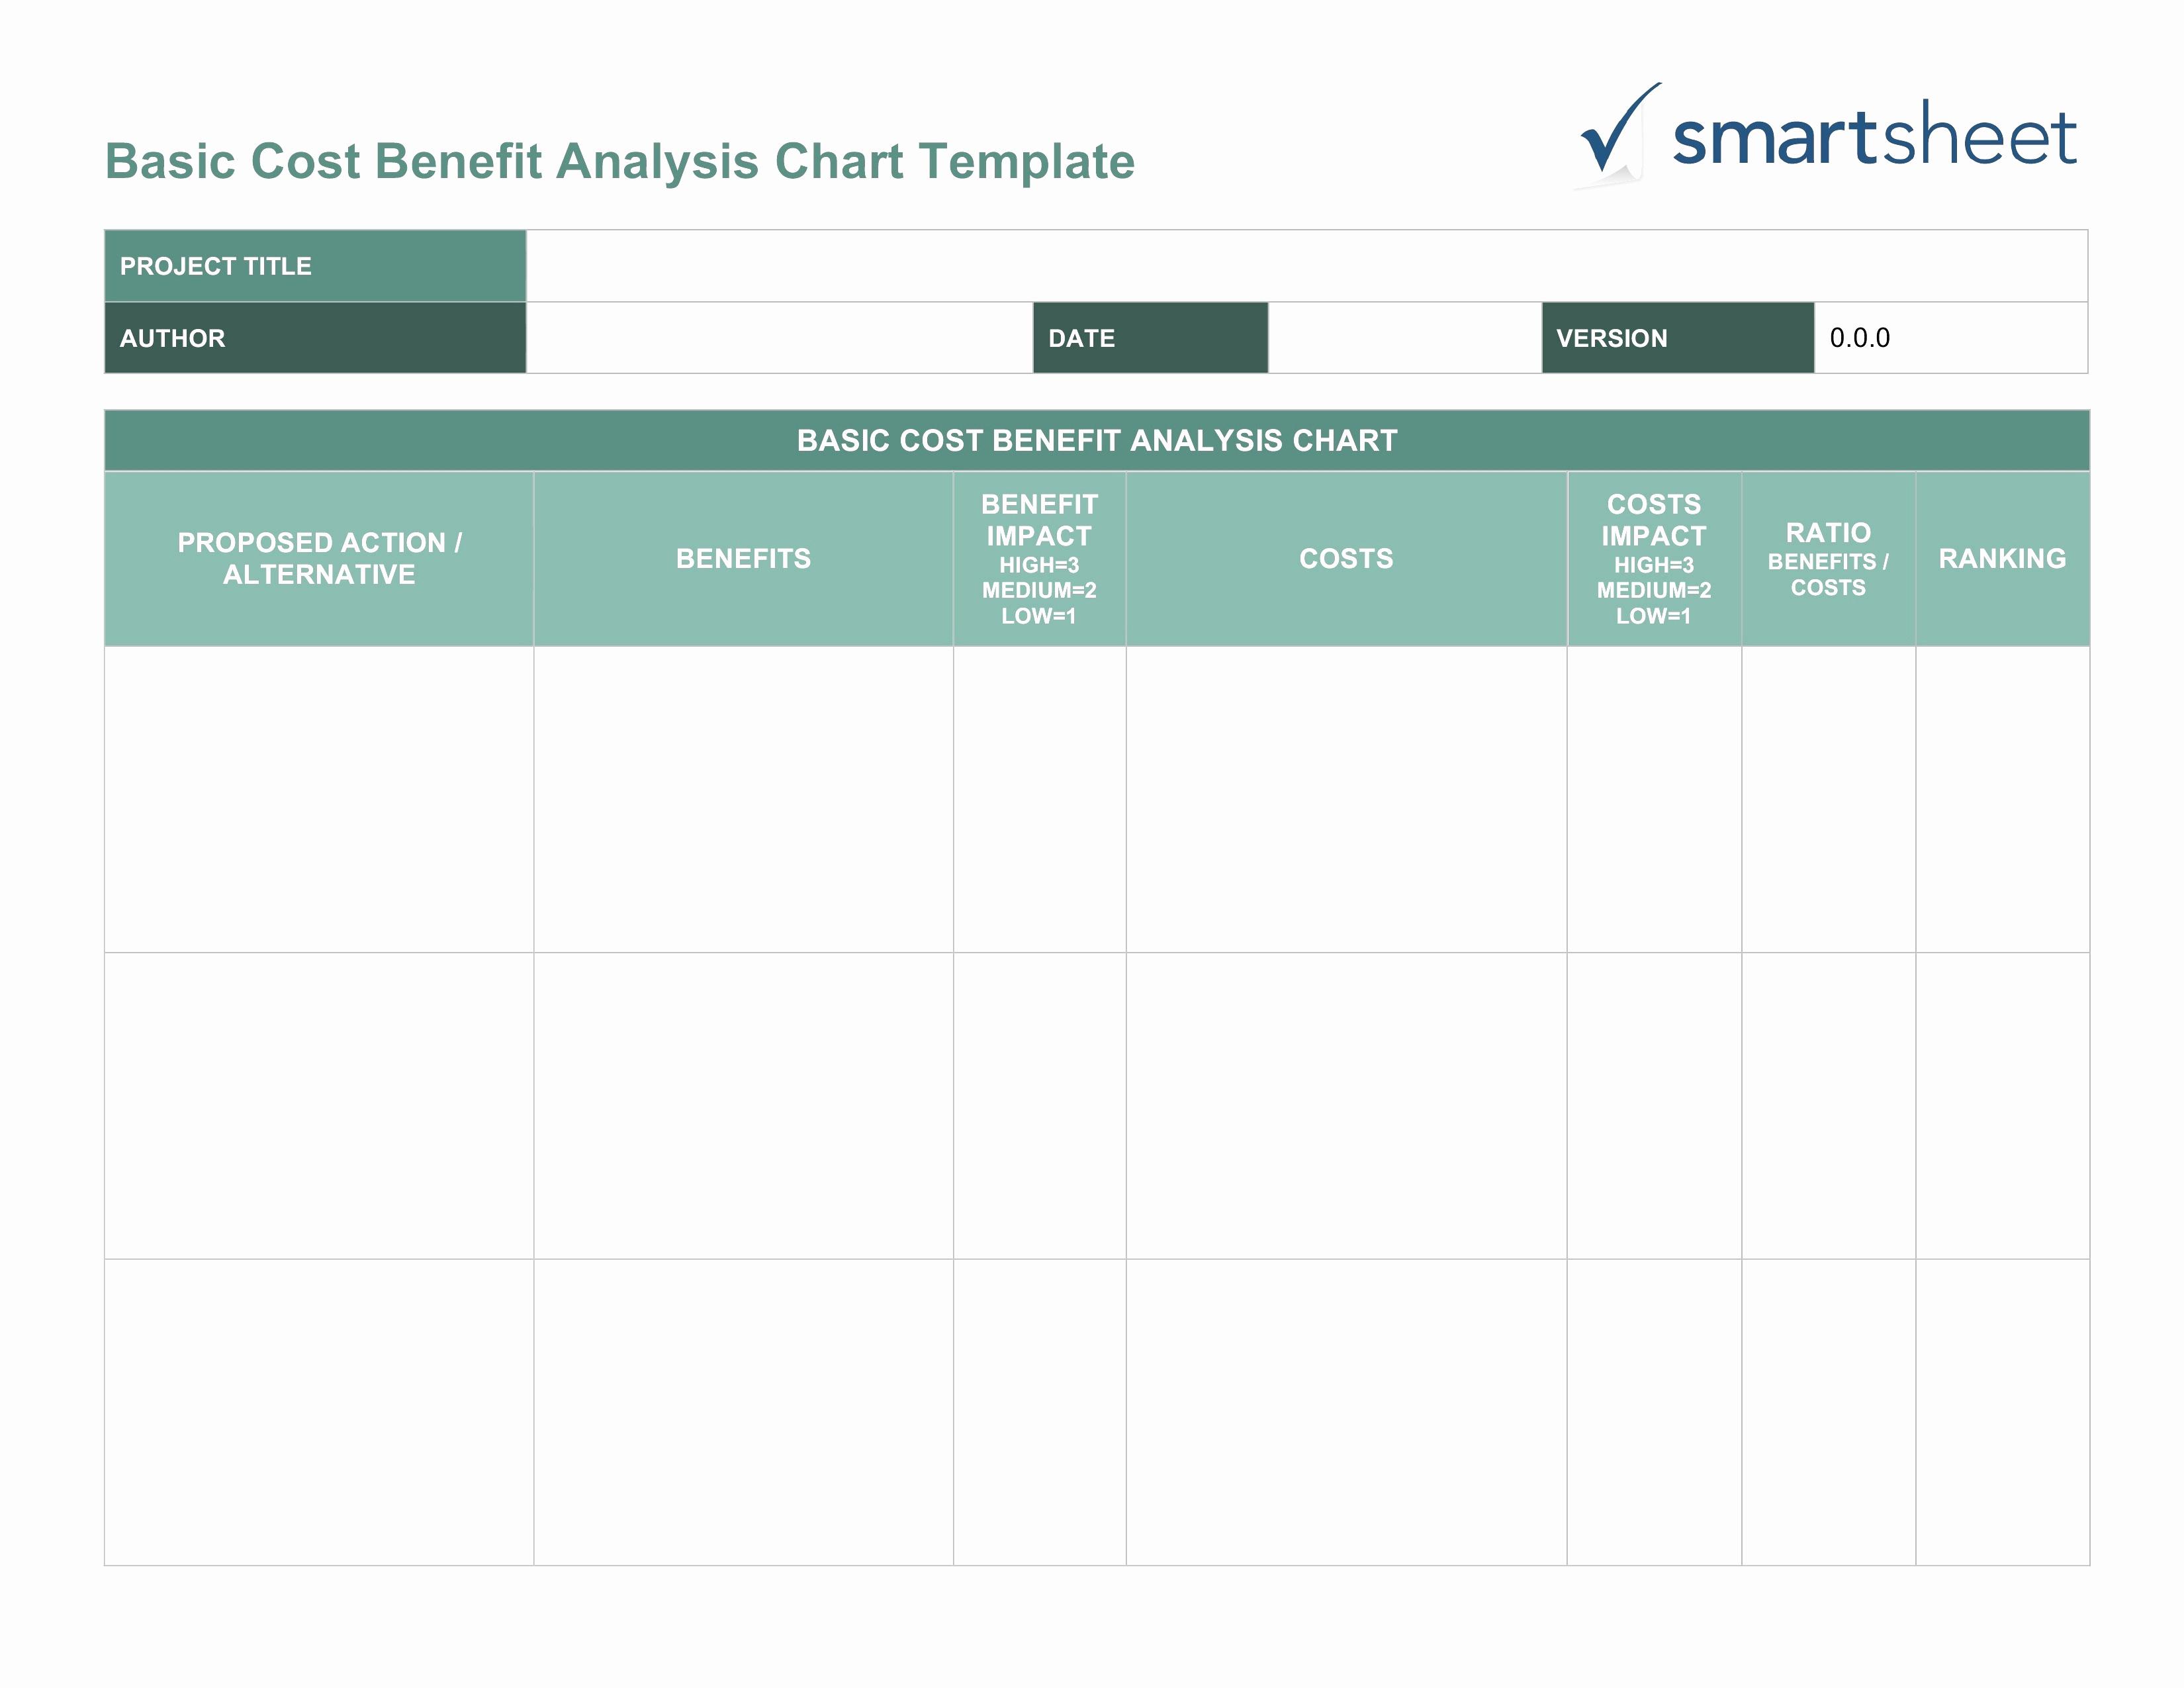 Mortgage Lender Comparison Spreadsheet For Mortgage Comparison Spreadsheet Awesome P And L Statement Template